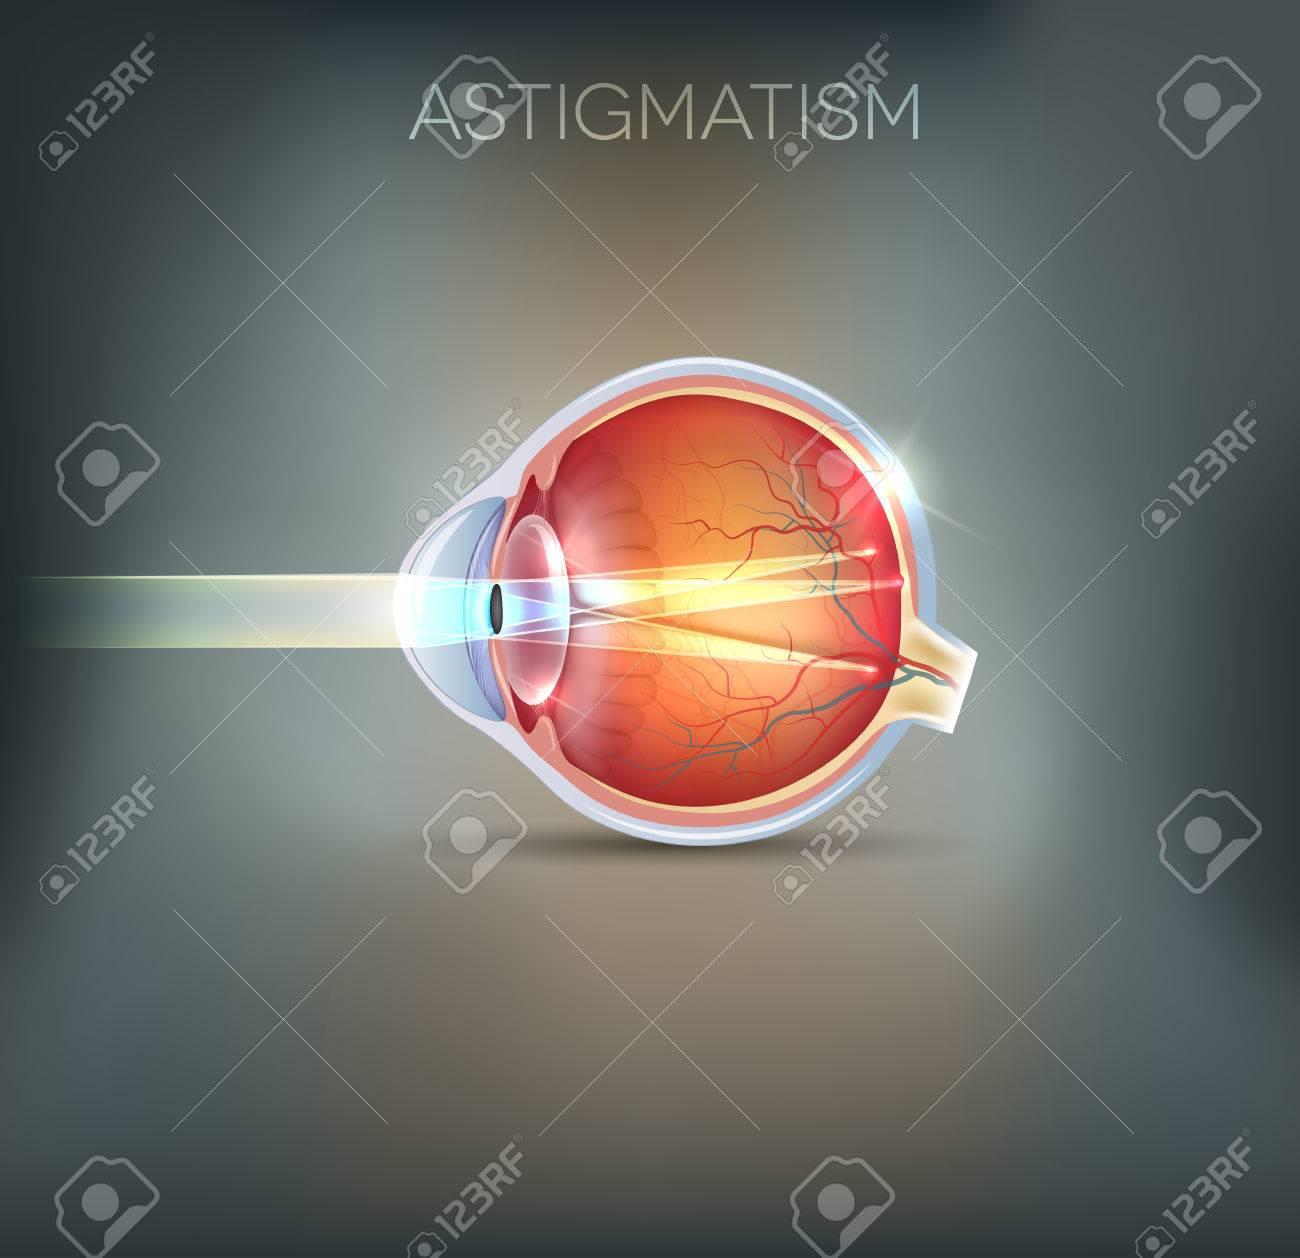 Human Vision Disorder Astigmatism Anatomy Of The Eye Cross